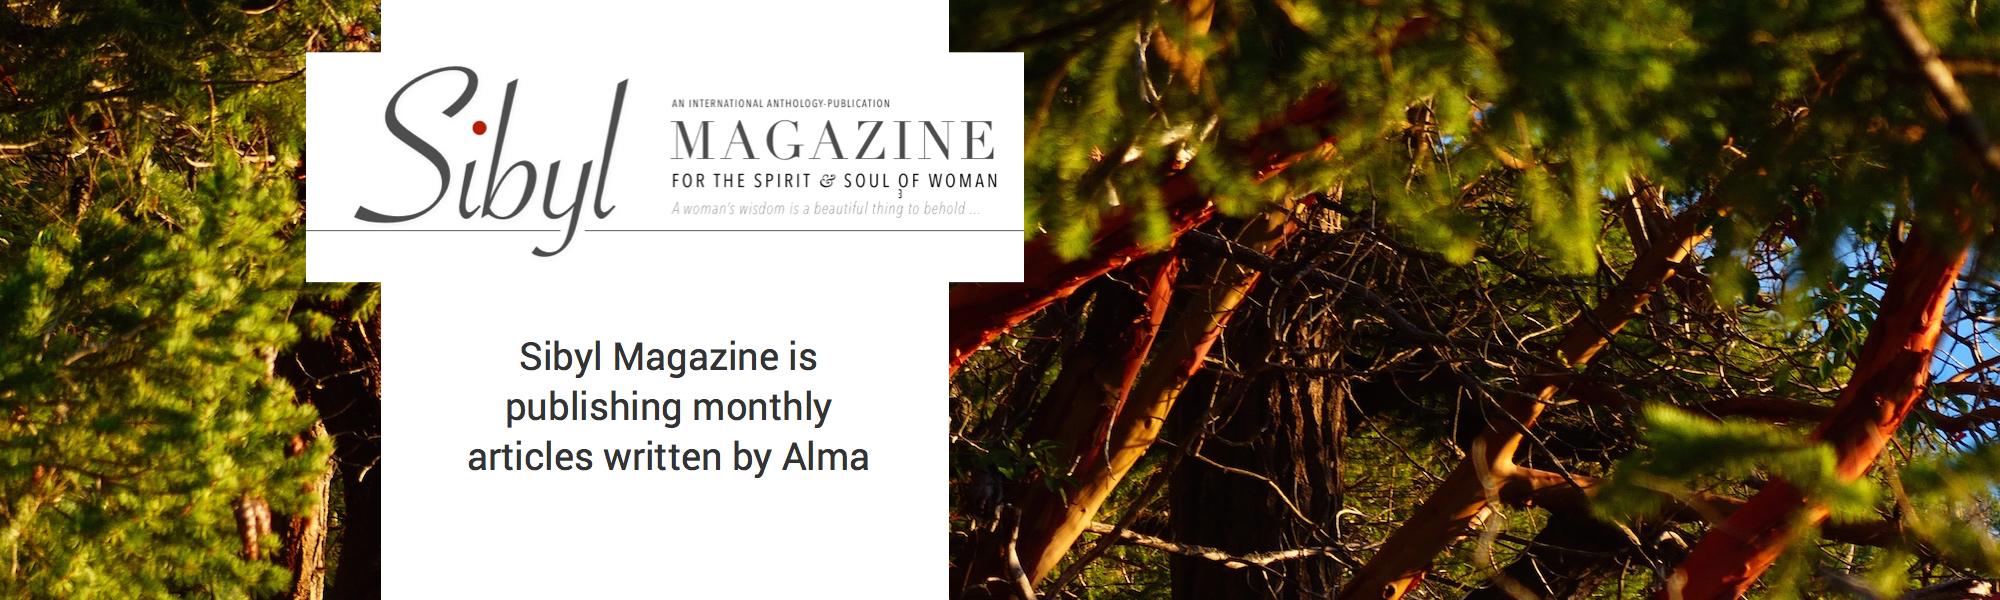 sibyl magazine articles by Alma Lightbody